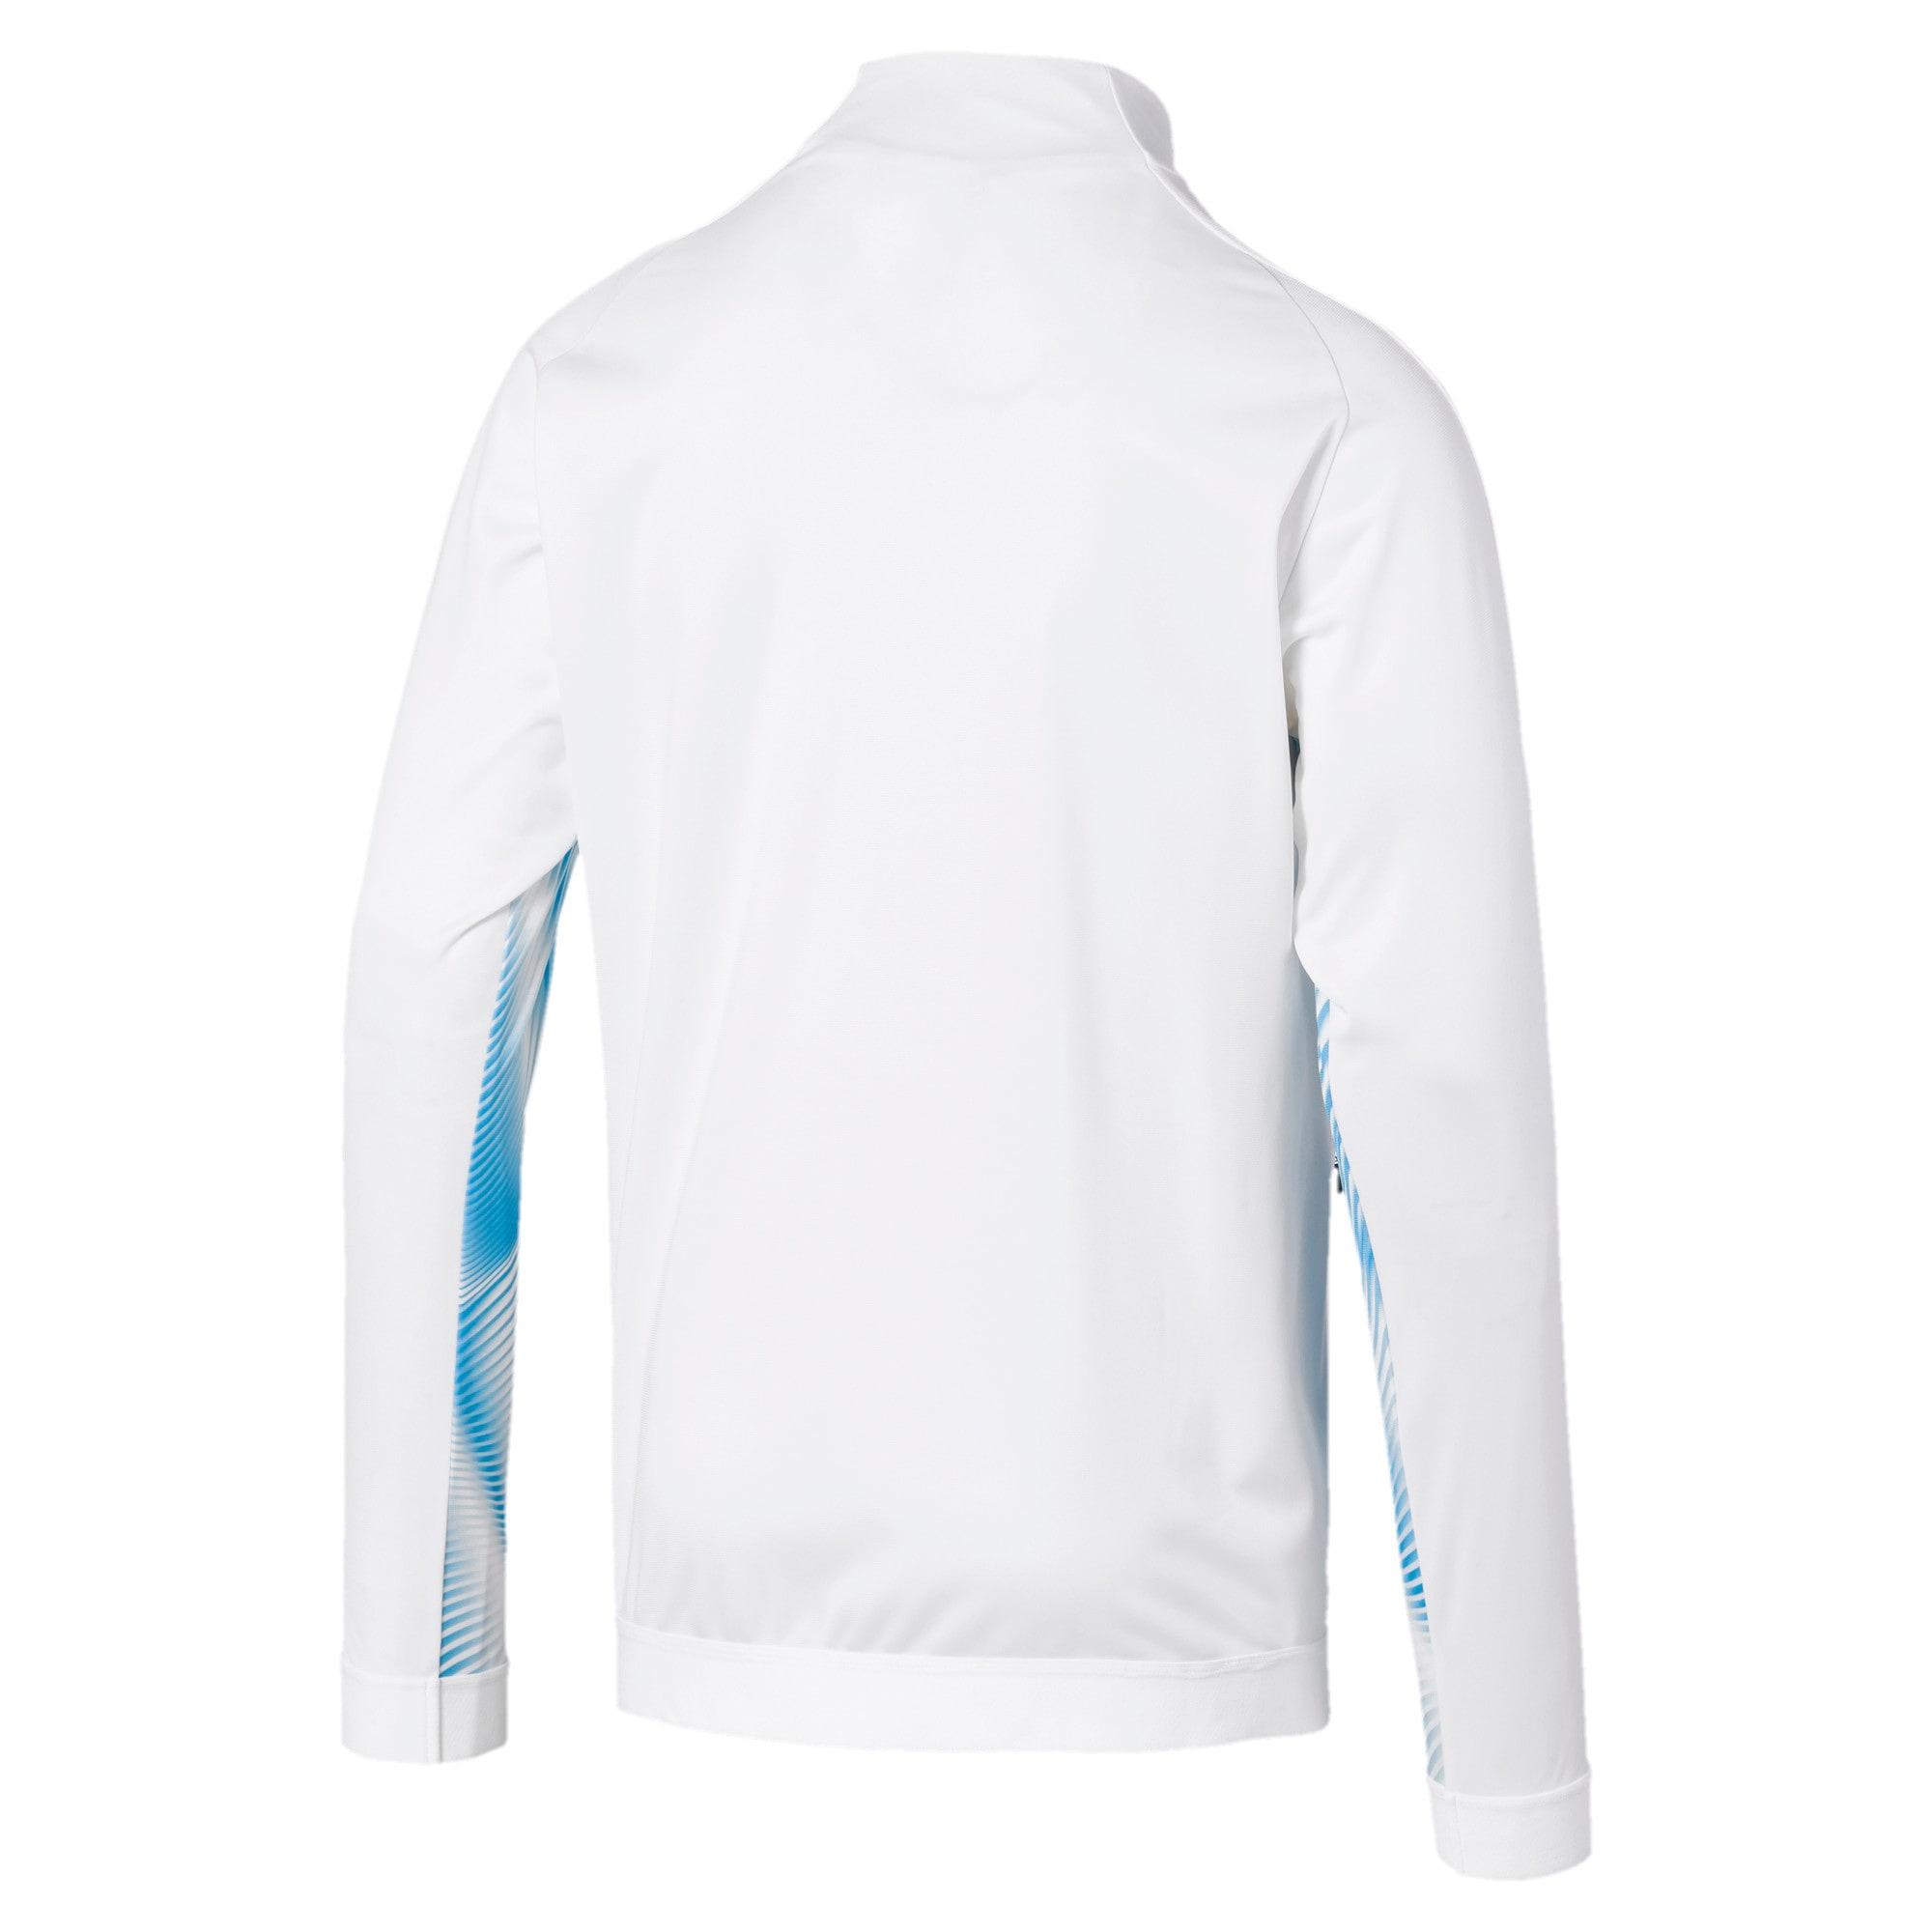 Thumbnail 2 of Olympique de Marseille Stadium Men's Jacket, Puma White-Bleu Azur, medium